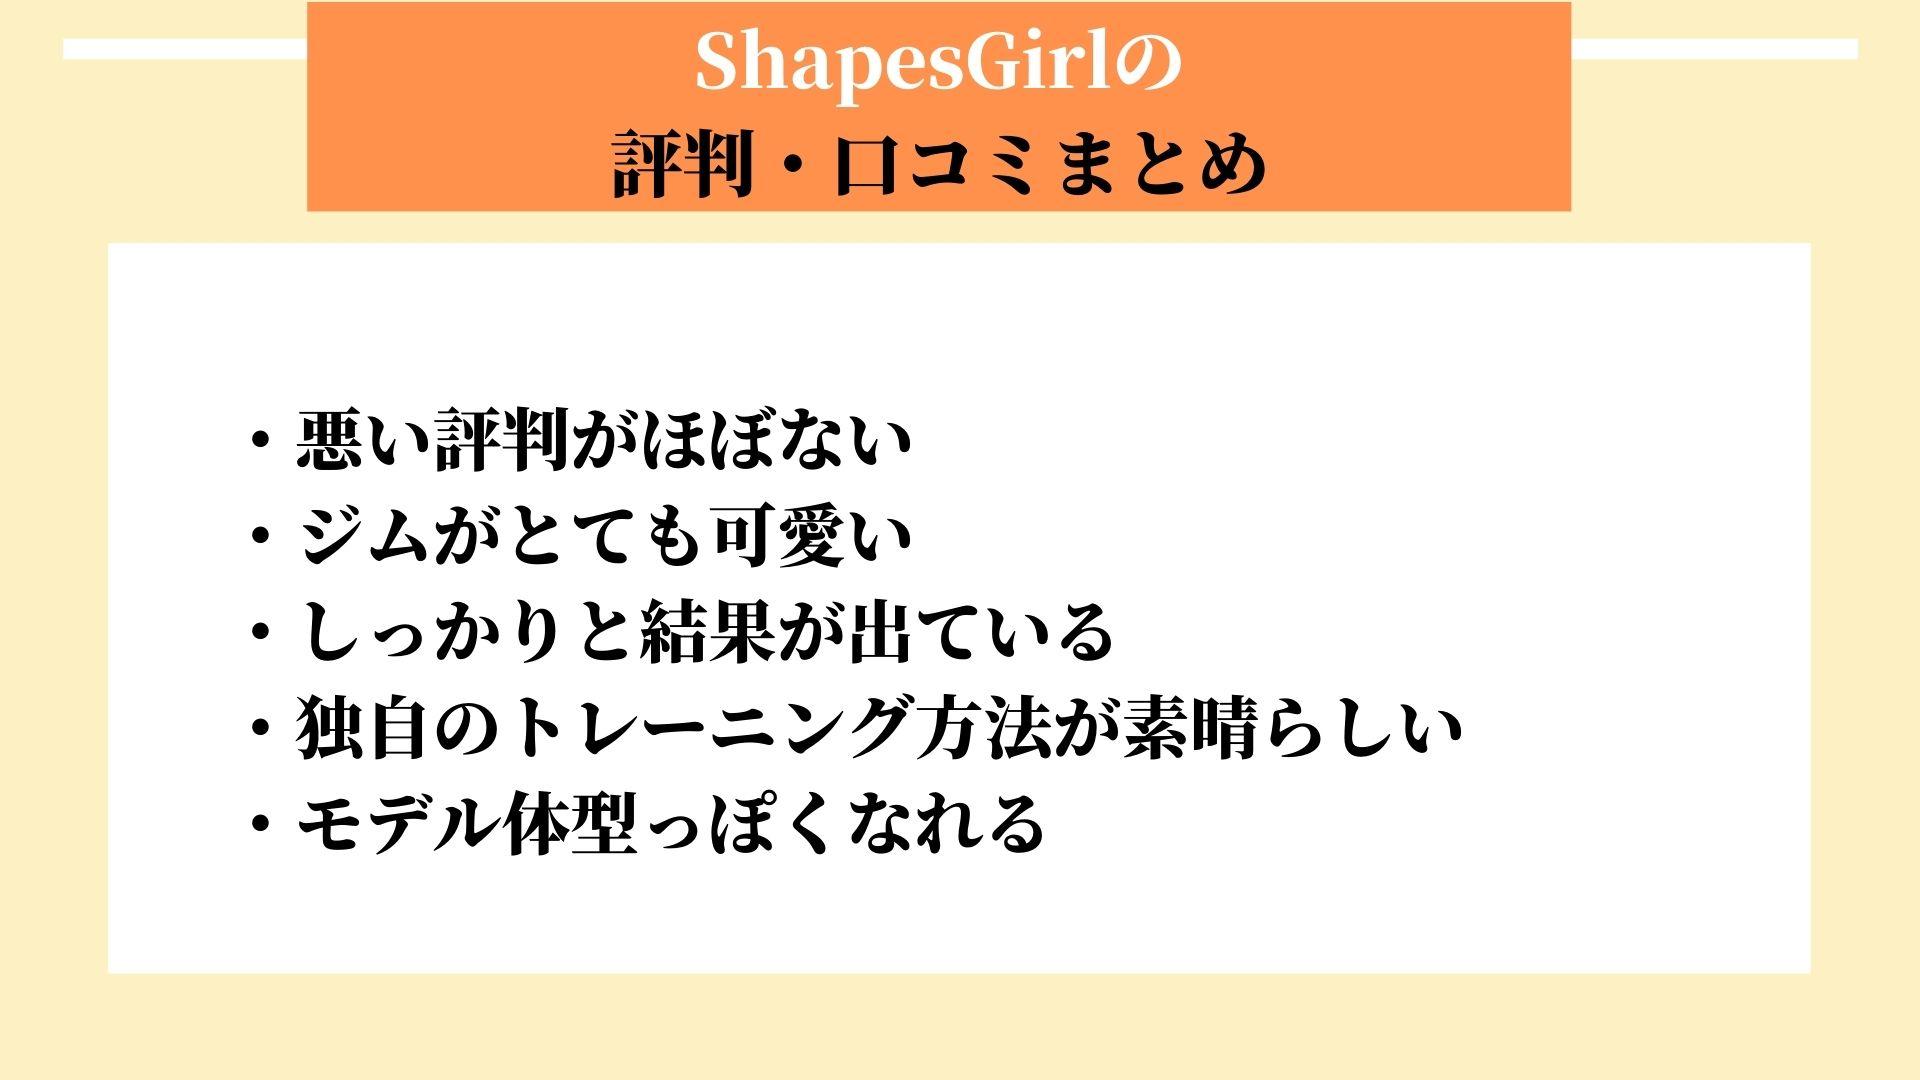 ShapesGirl 評判・口コミまとめ